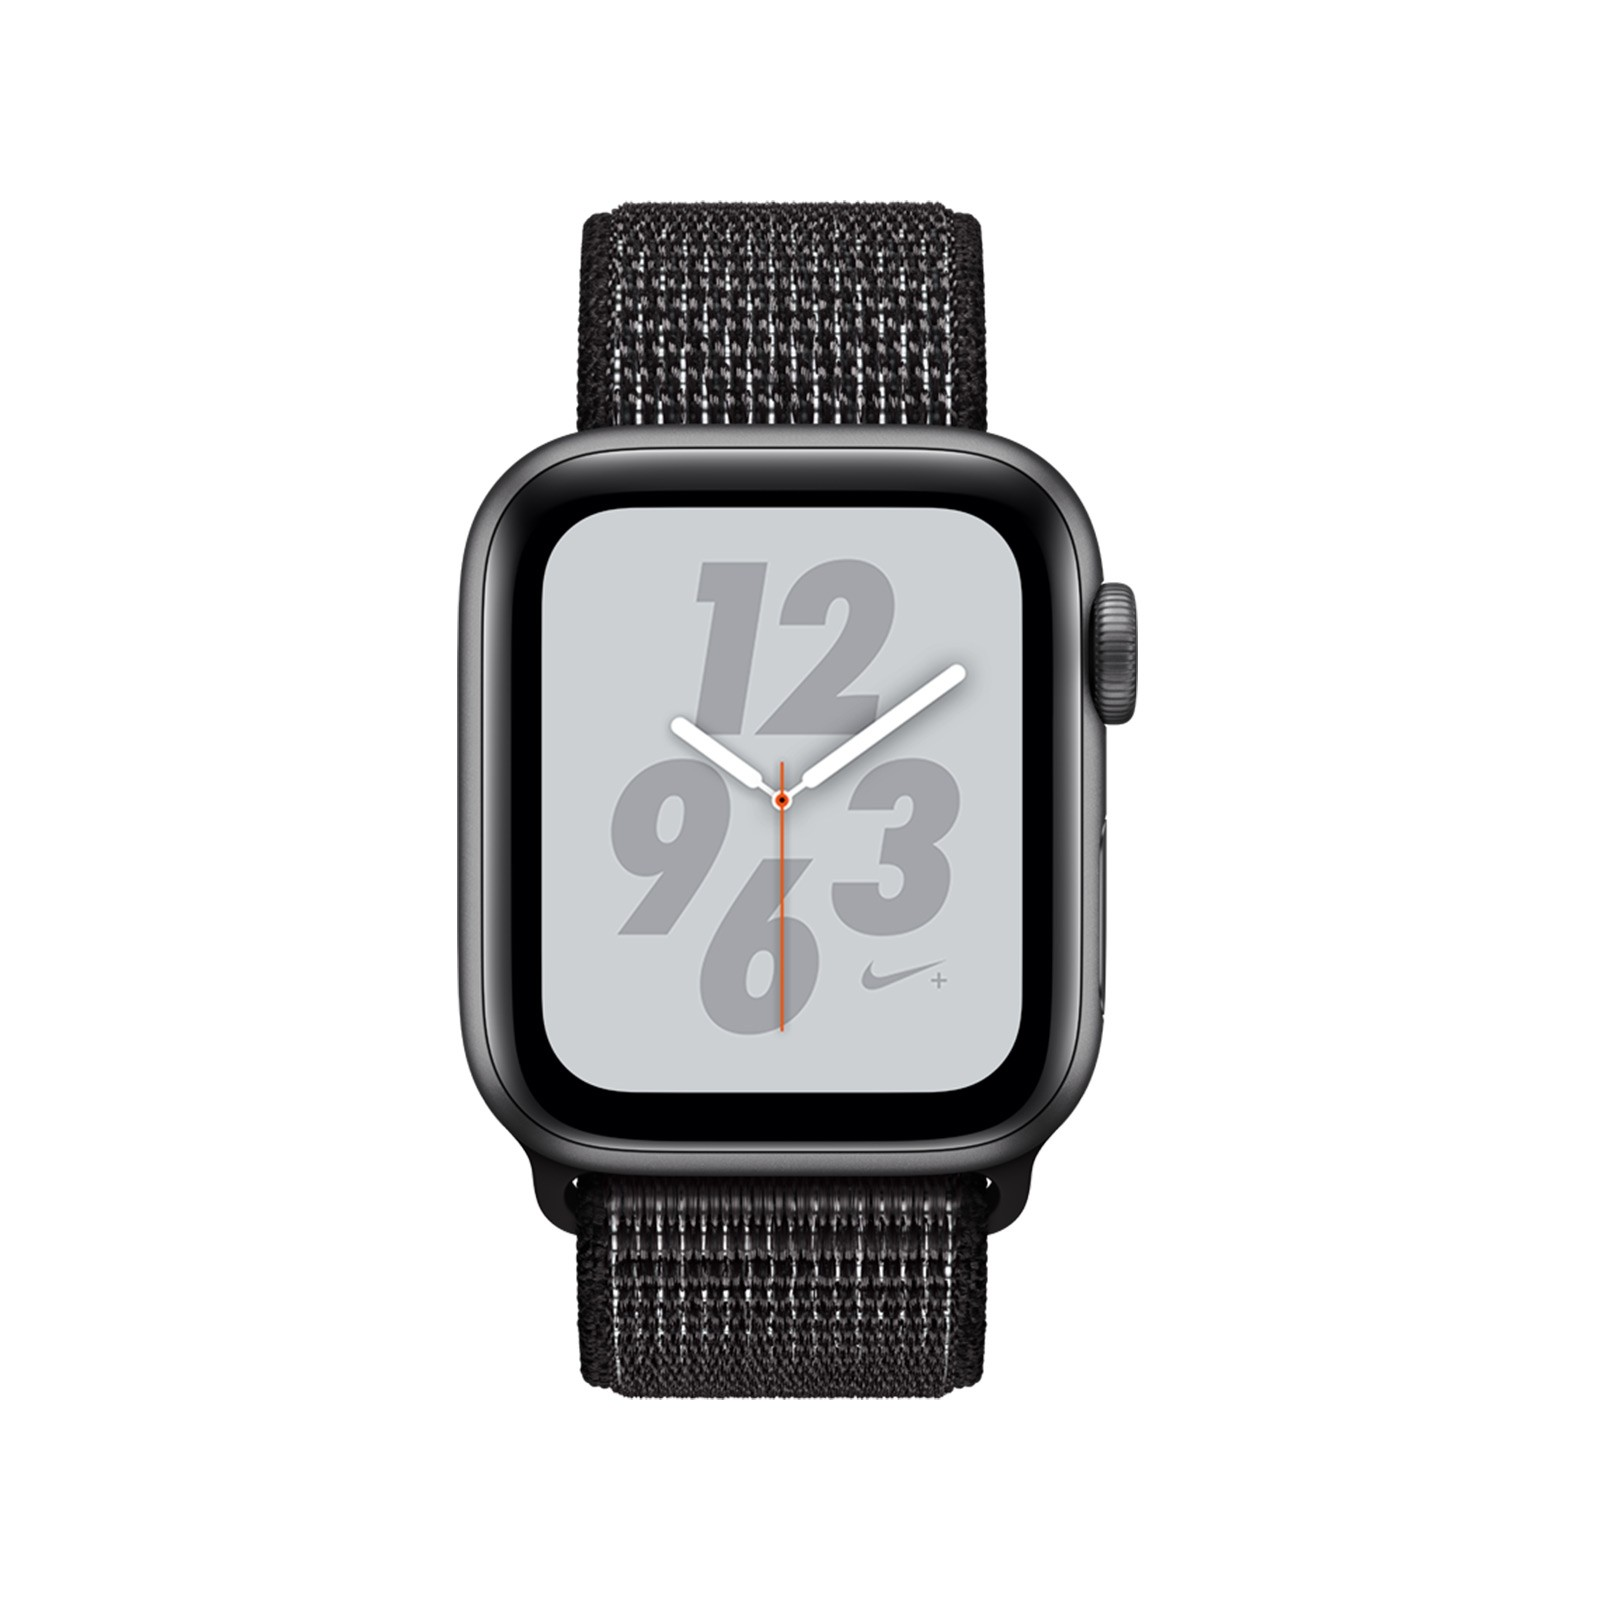 Смарт часы Apple watch Nike+ Series 4 GPS 40mm Space, спортивный ремешок  черного цвета (MU7G2GK/A) Nike+ Series 4 GPS 40mm Space Grey Aluminium Case with Black Nike Sport Loop (MU7G2GK/A)